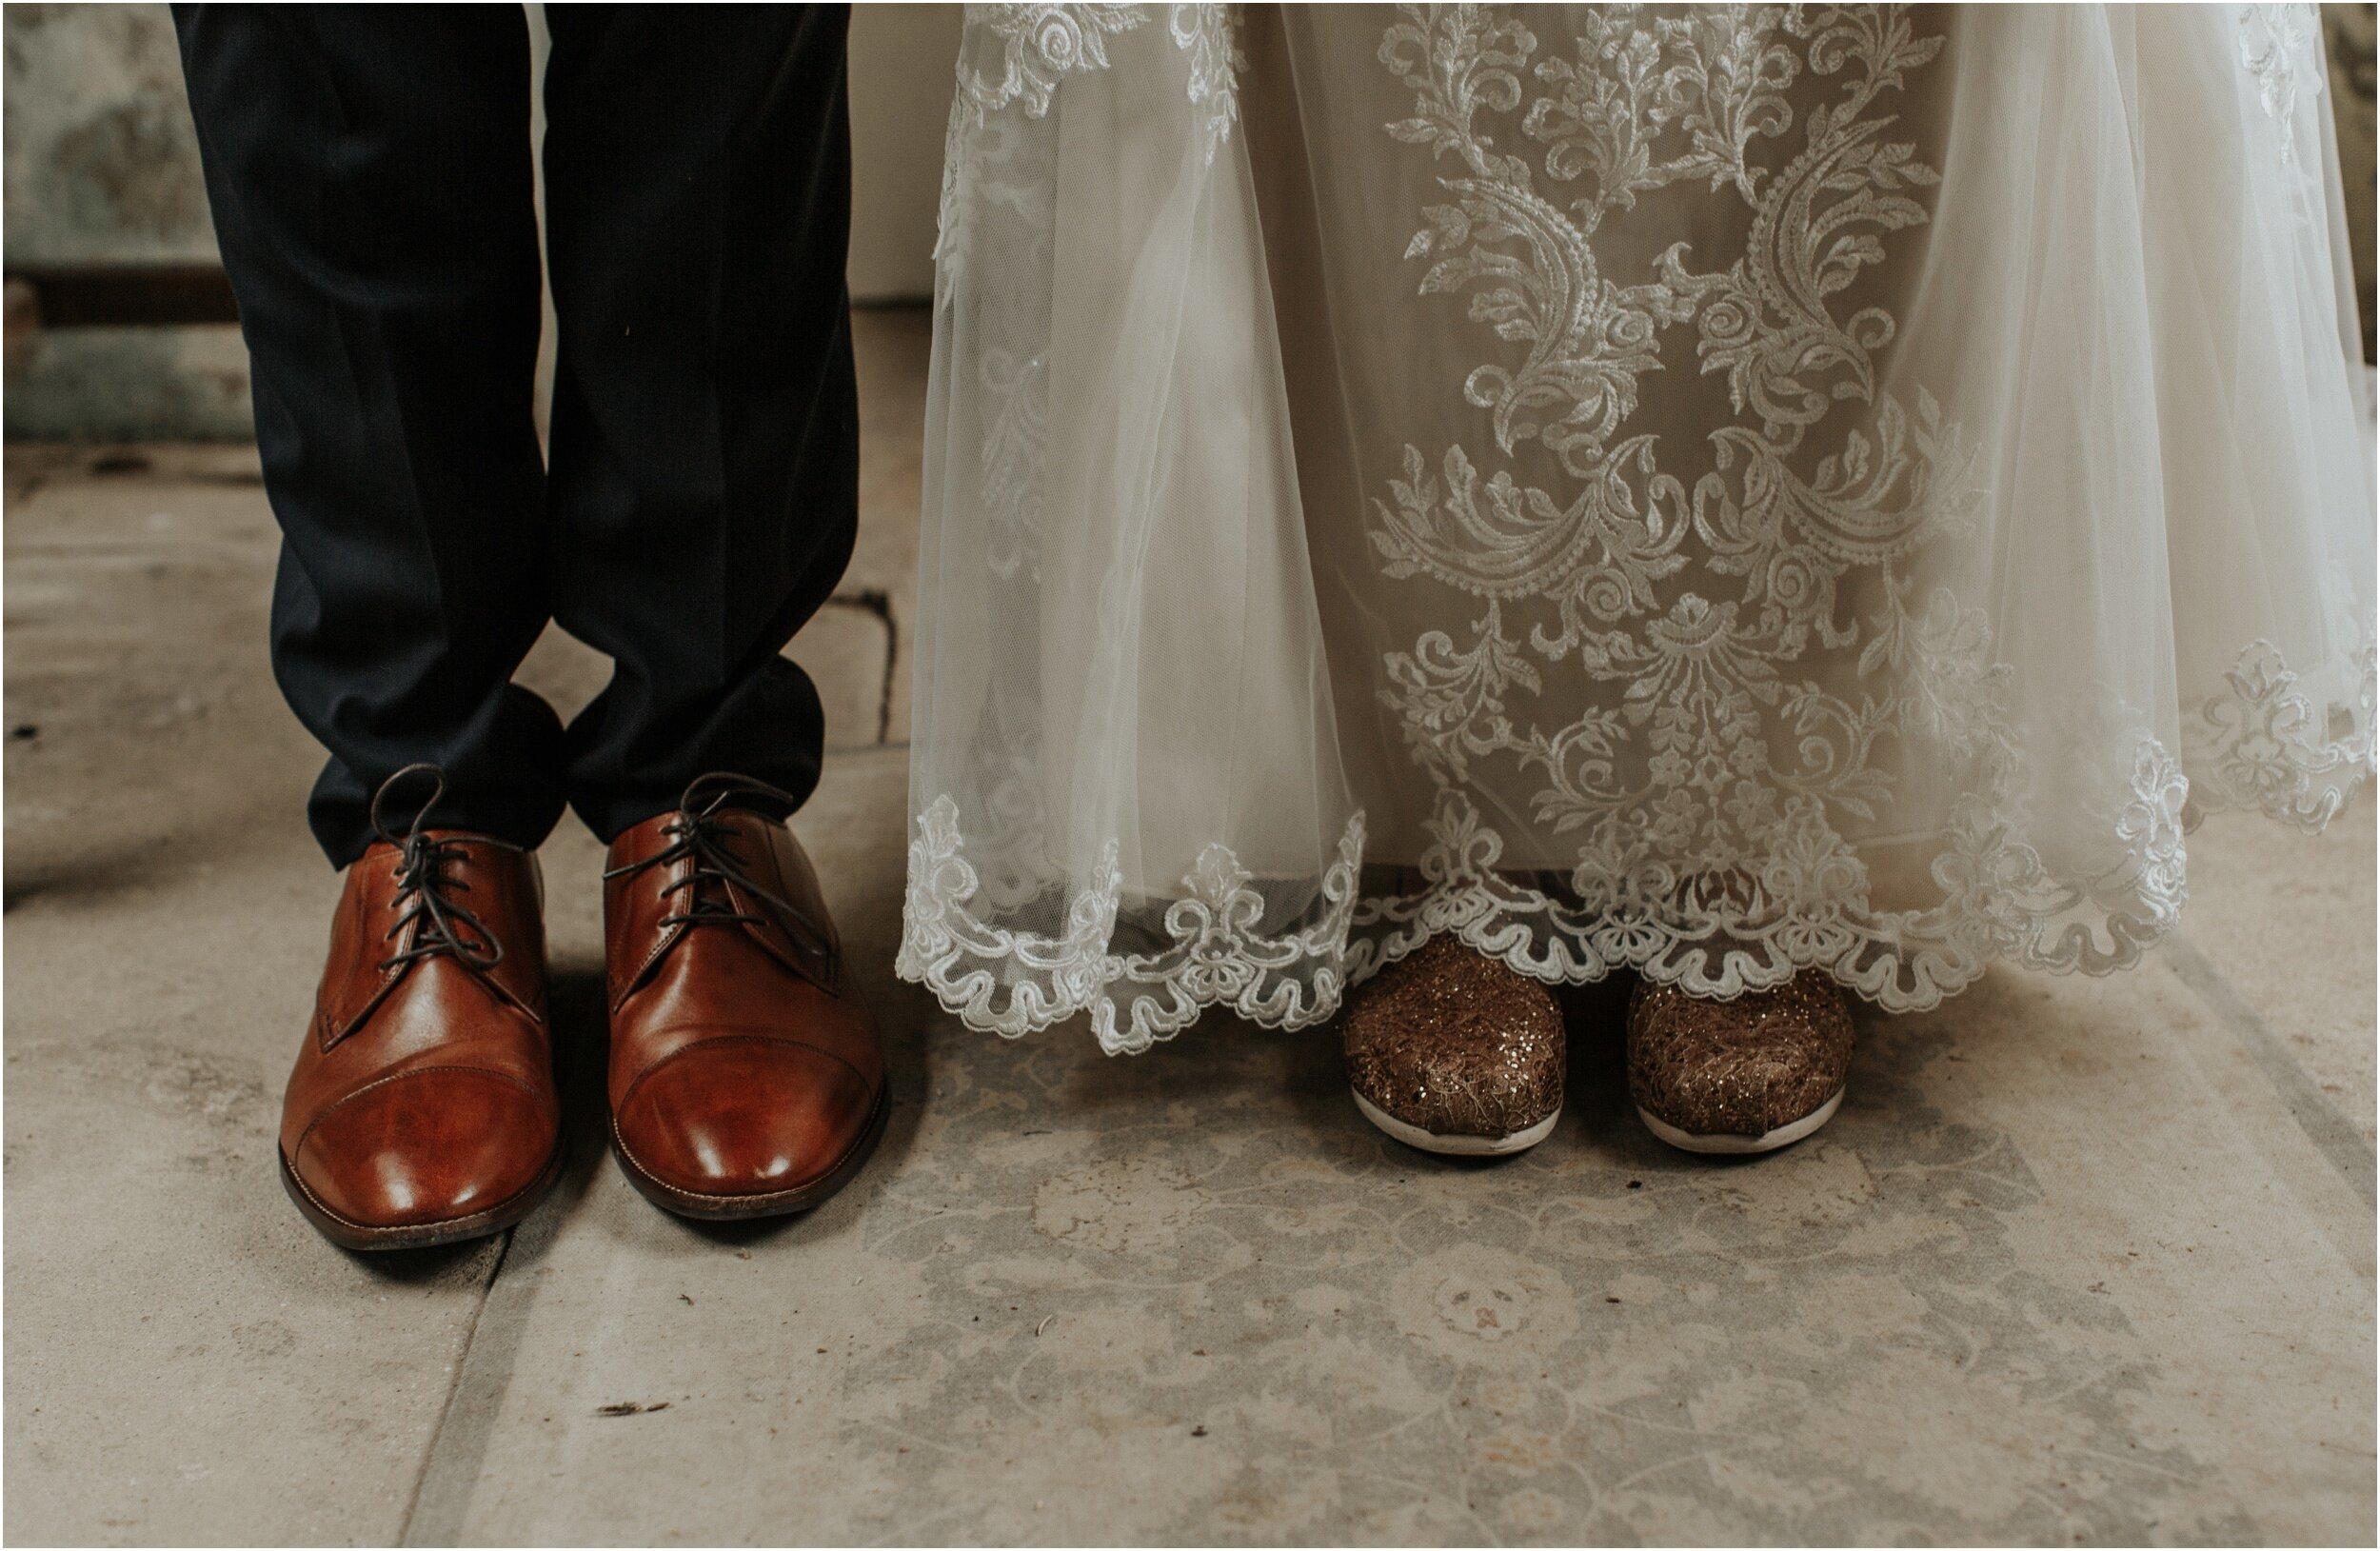 steph-and-jordan-cox-our-wedding-historic-shady-lane-compass-wedding-collective-hazel-lining-photography-destination-elopement-wedding-engagement-photography_0039.jpg